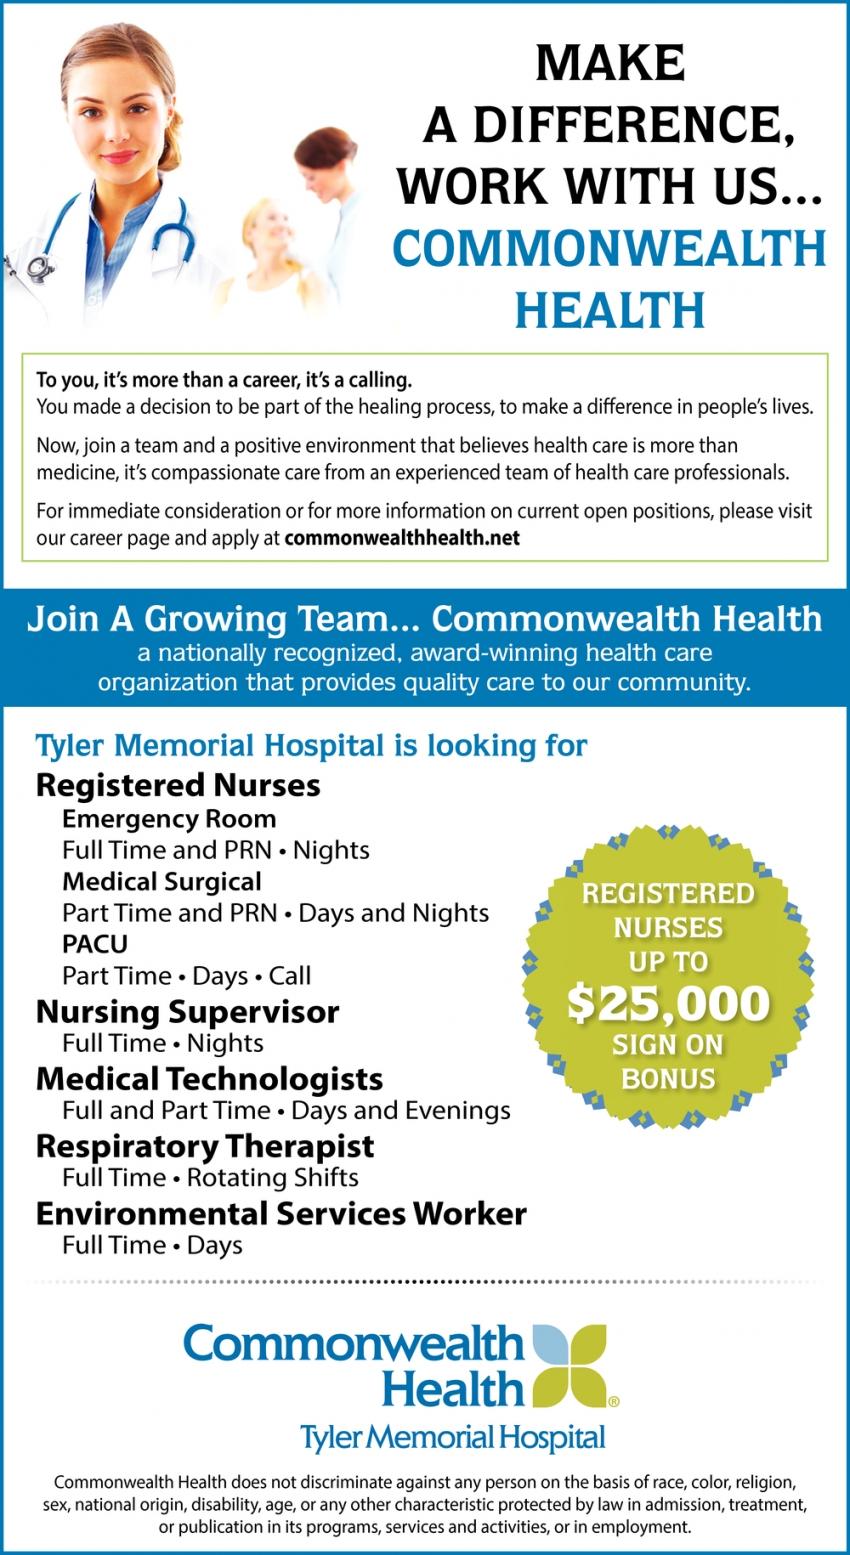 Registered Nurses, Nursing Supervisor, Medical Technologists, Respiratory Therapist, Environmental Services Worker